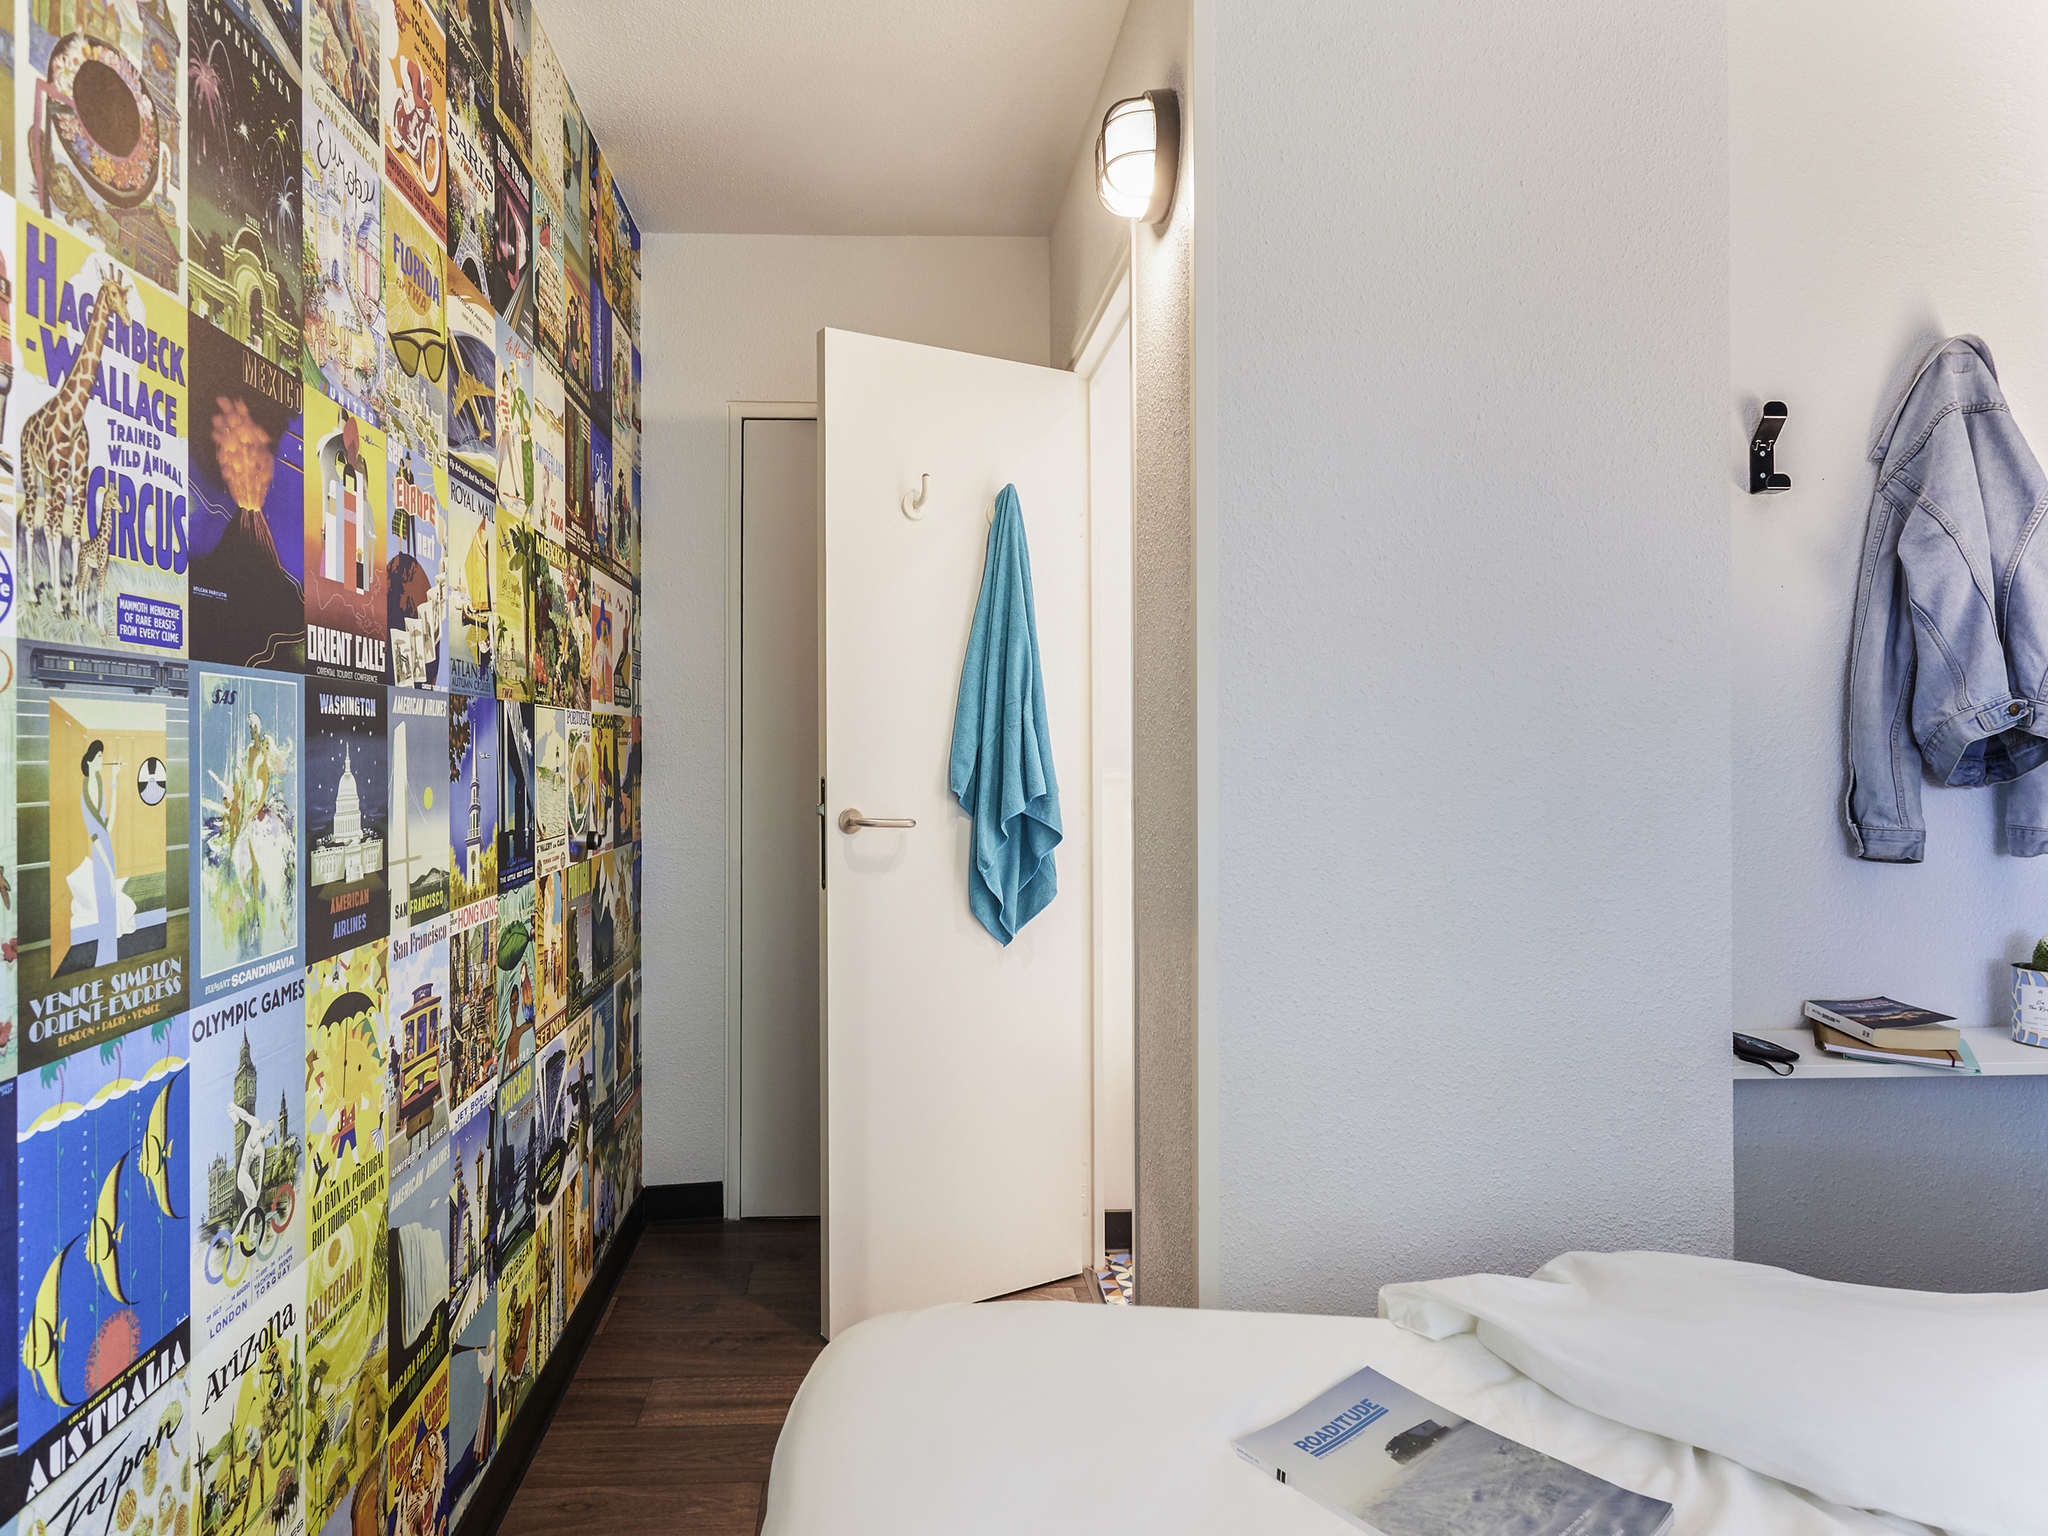 Hotel in PARIS hotelF1 Paris Porte de Montmartre